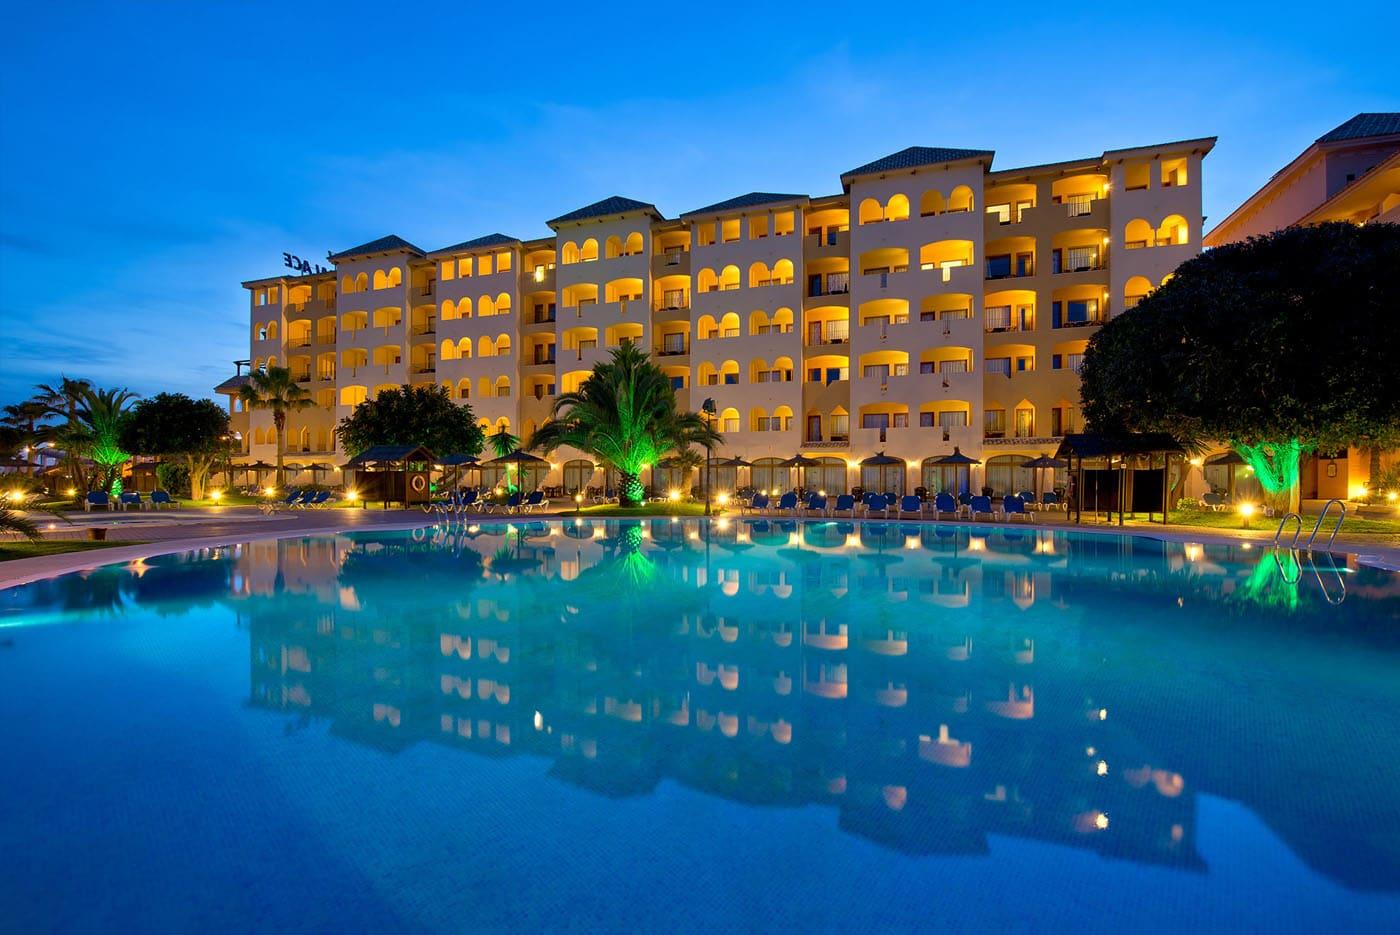 hotel-ipv-fuengirola-adolfo-gosalvez-hoteles-panoramicos